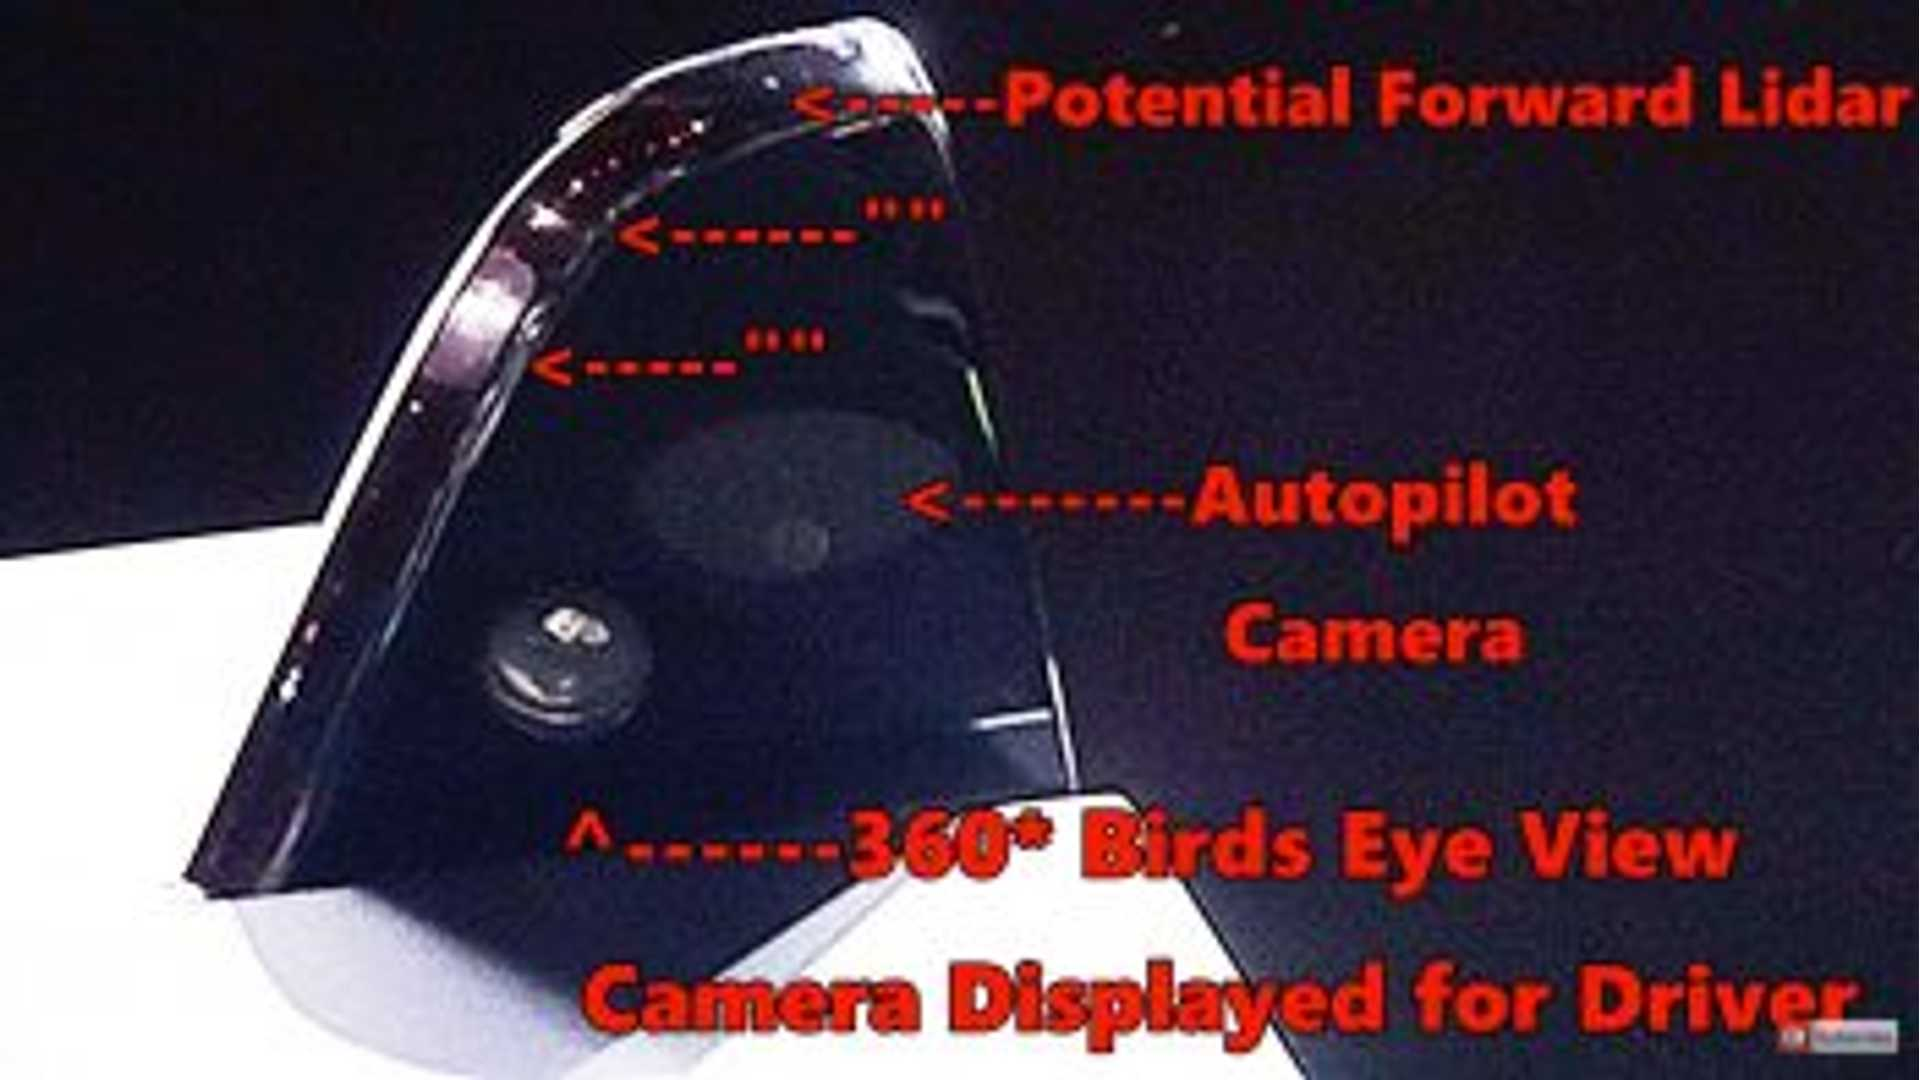 Tesla Semi Autopilot Sensors Pointed Out, Potential LiDAR